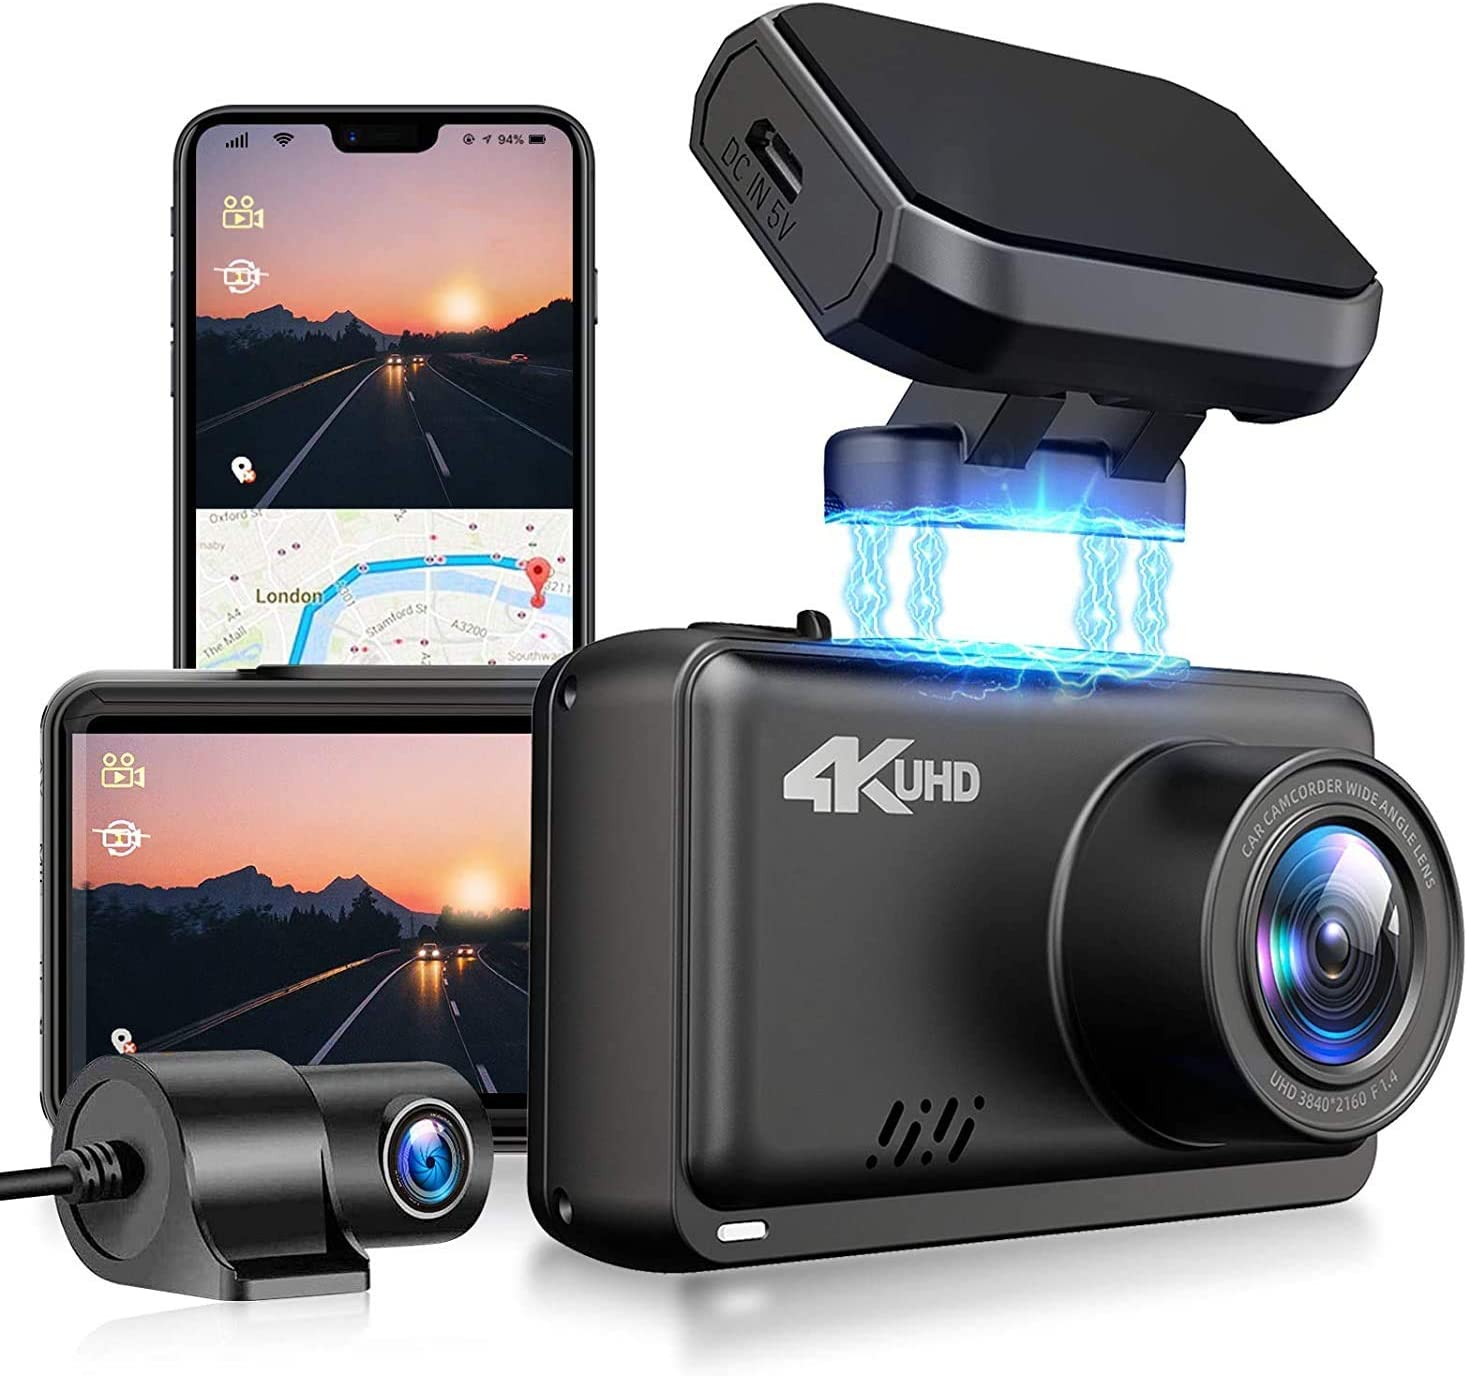 Jomise F2s 4k 1080p Dashcam Mit Gps Wifi Dual Lens Elektronik